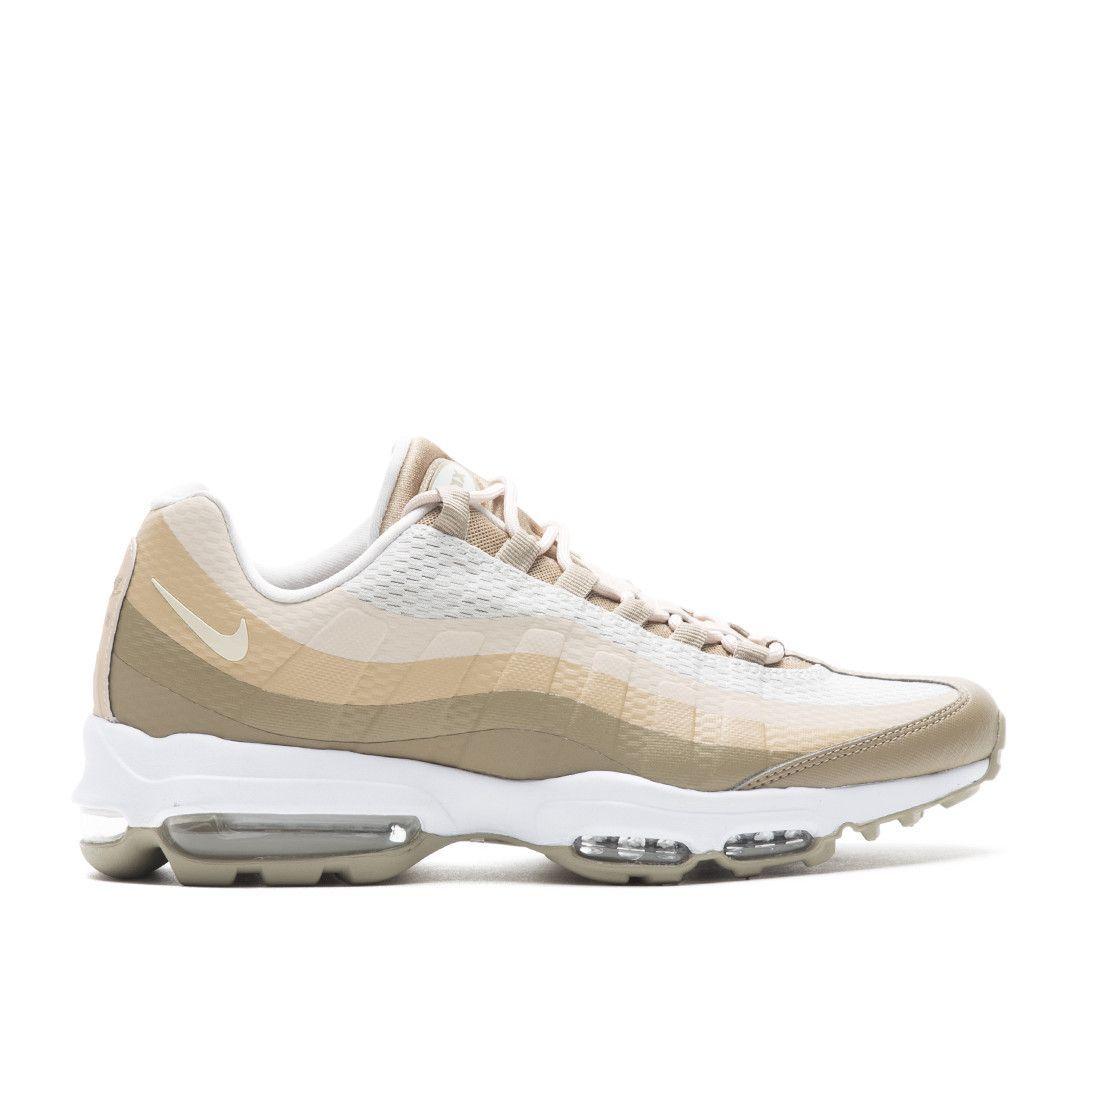 d73e25e7faac4 Nike Air Max 95 Ultra Essential - EU Kicks  Sneaker Magazine